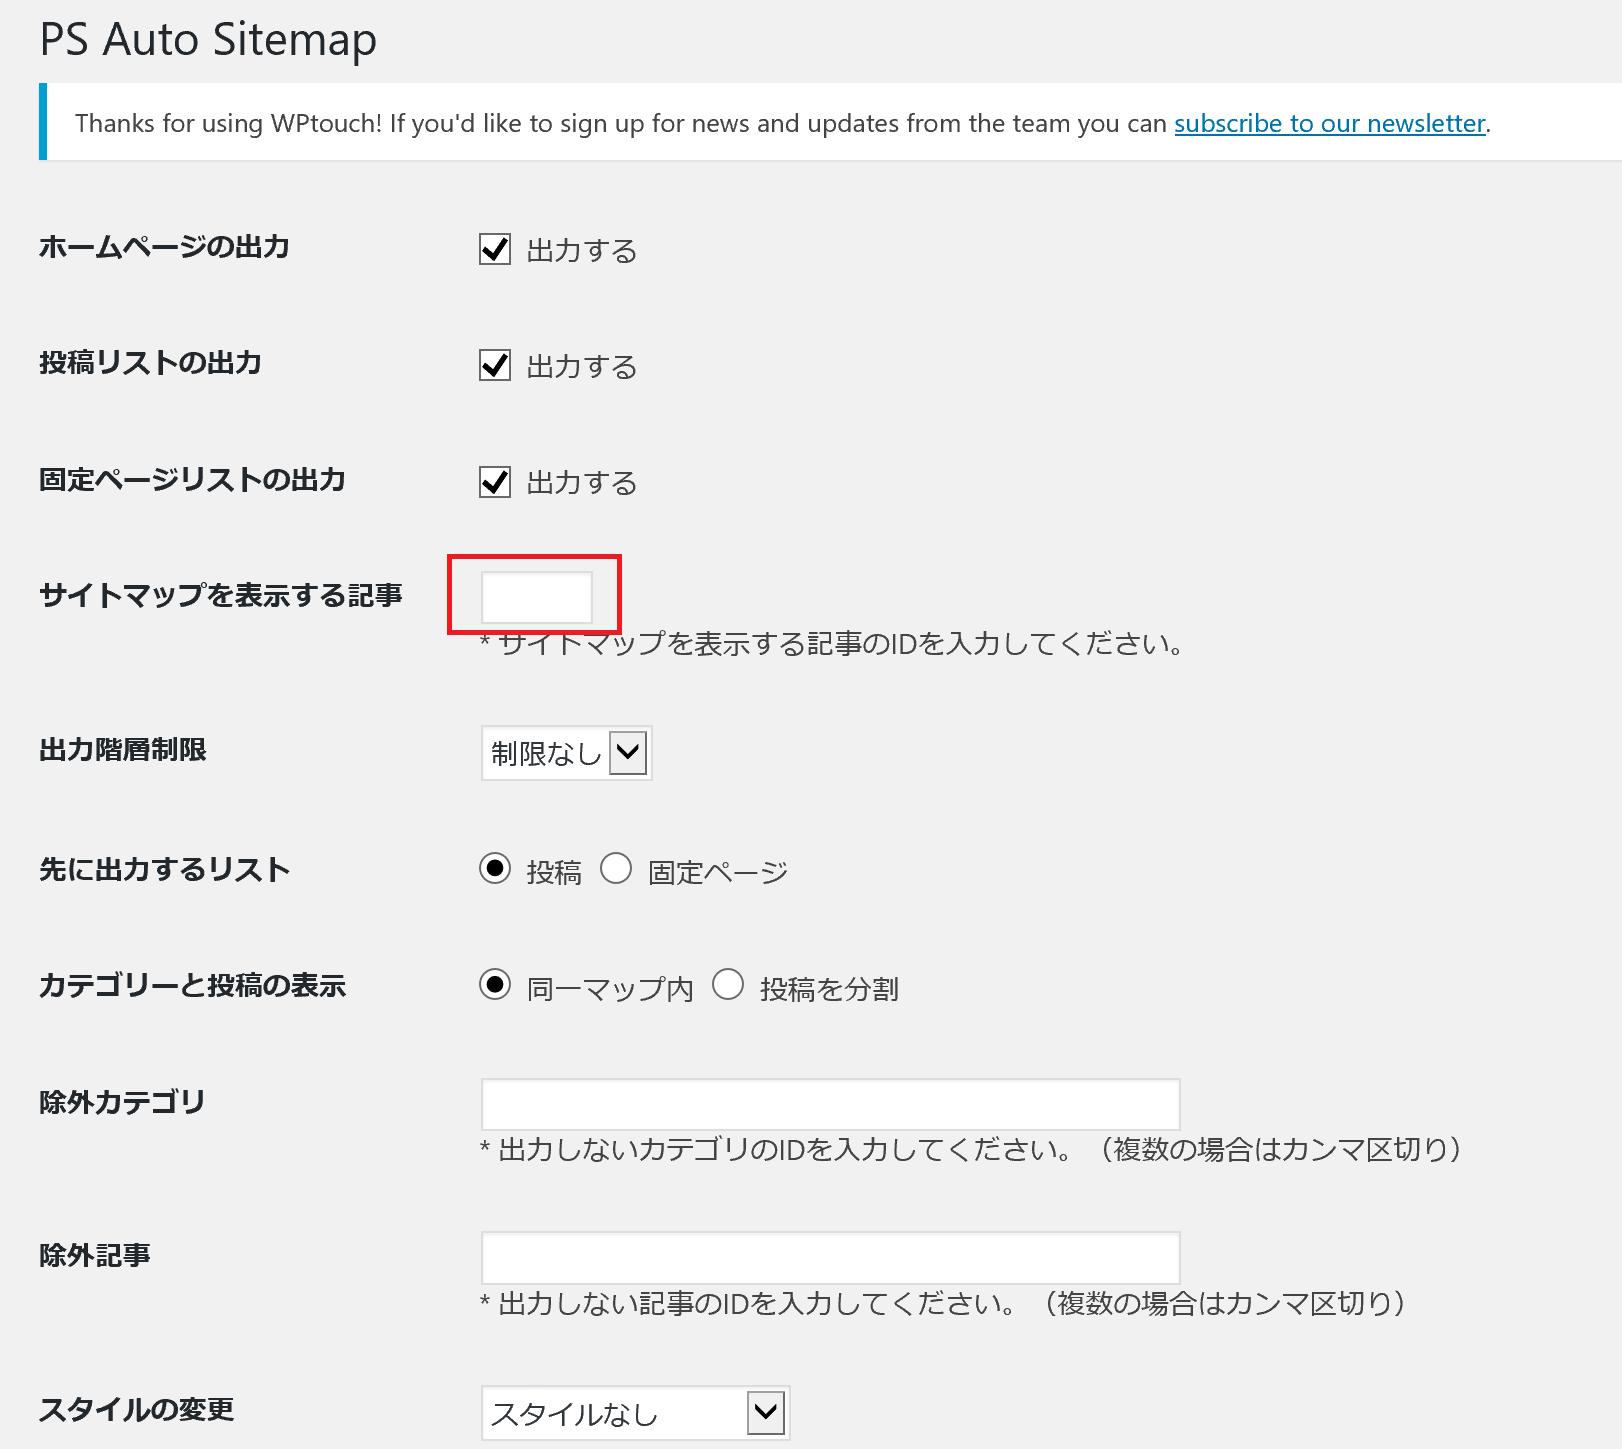 PS Auto Sitemap setting - WordPressのサイトマップの作成方法!おすすめプラグイン4つも紹介